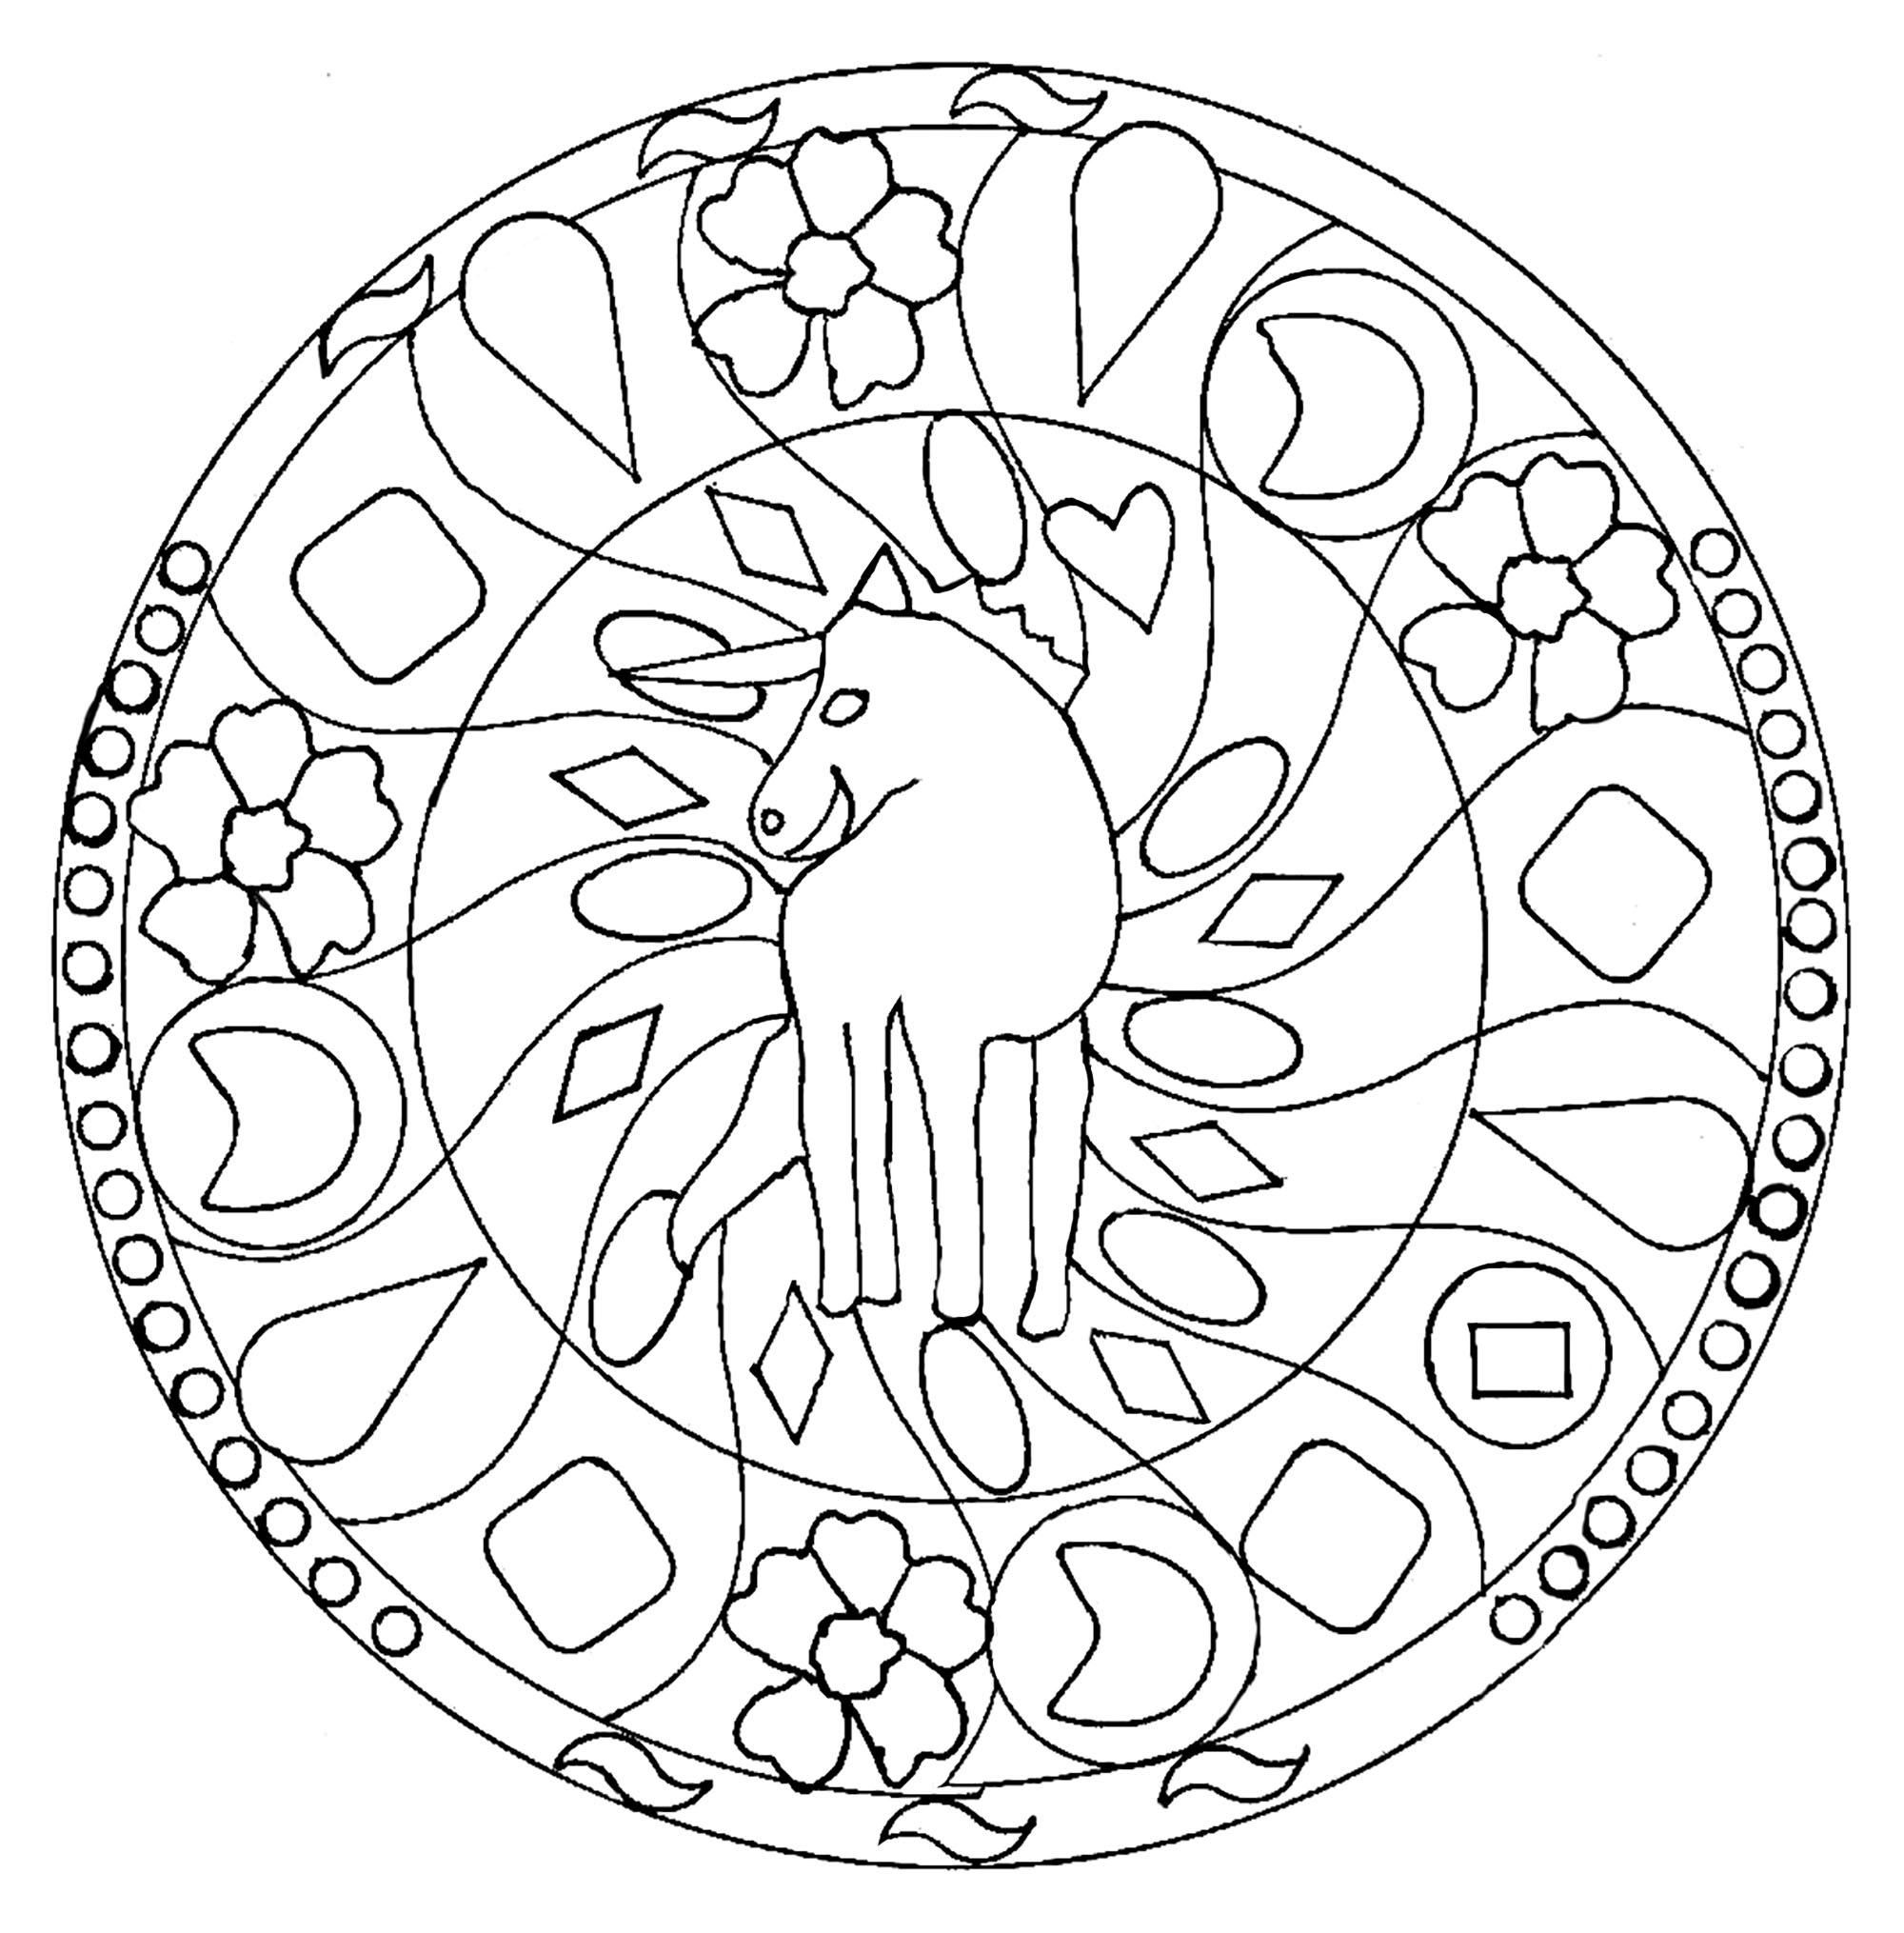 Mandala Domandala 4 Mandalas Coloriages Difficiles